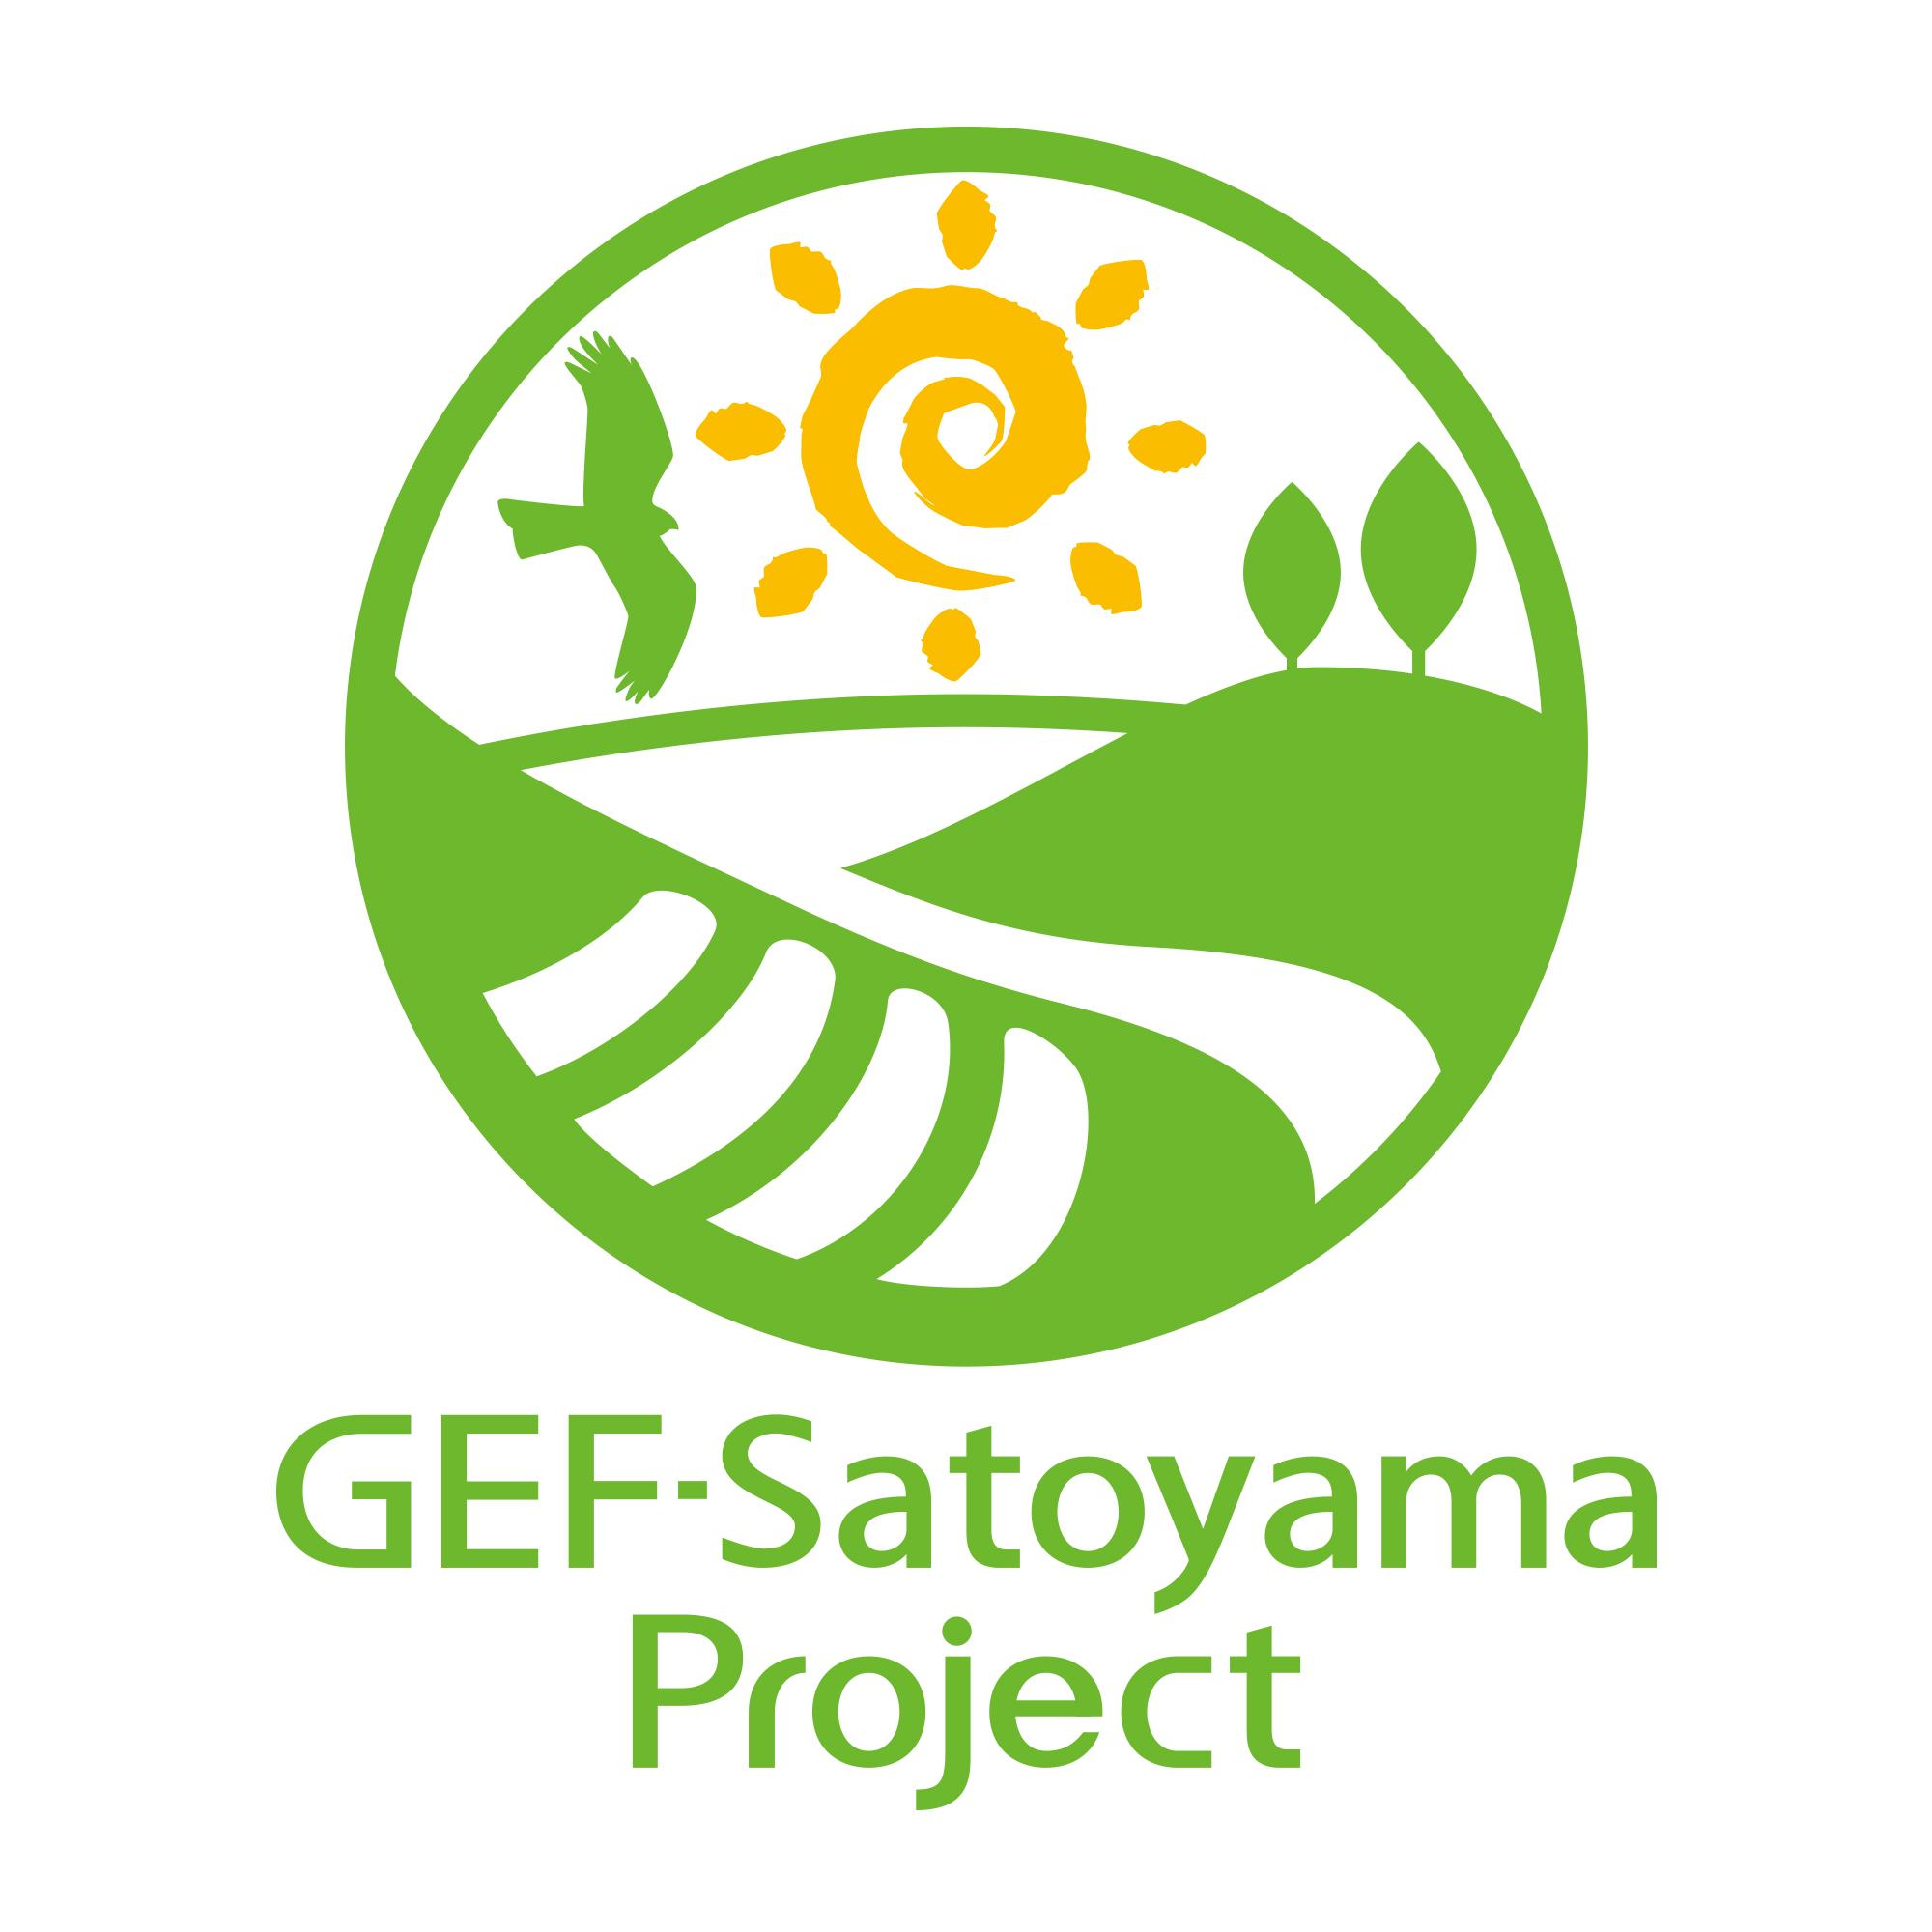 Gef Satoyama Project